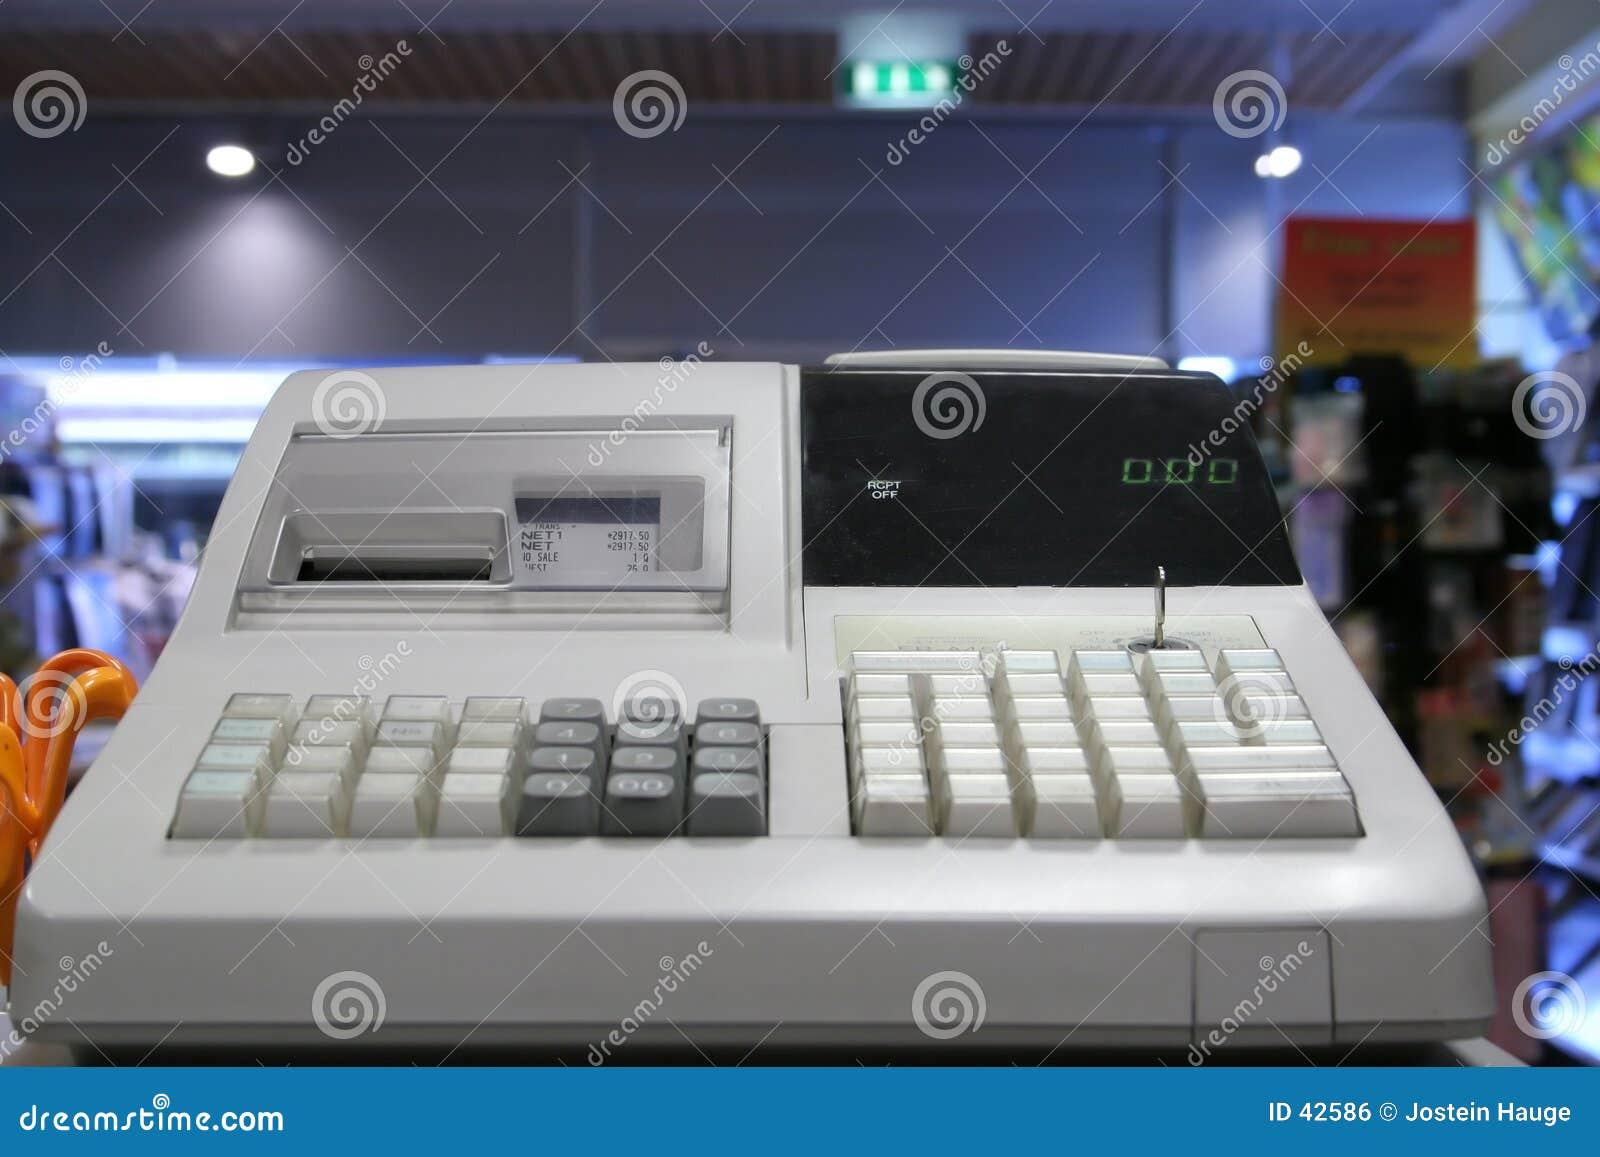 Cash Register Stock Photo Image Of Shop Making Store 42586